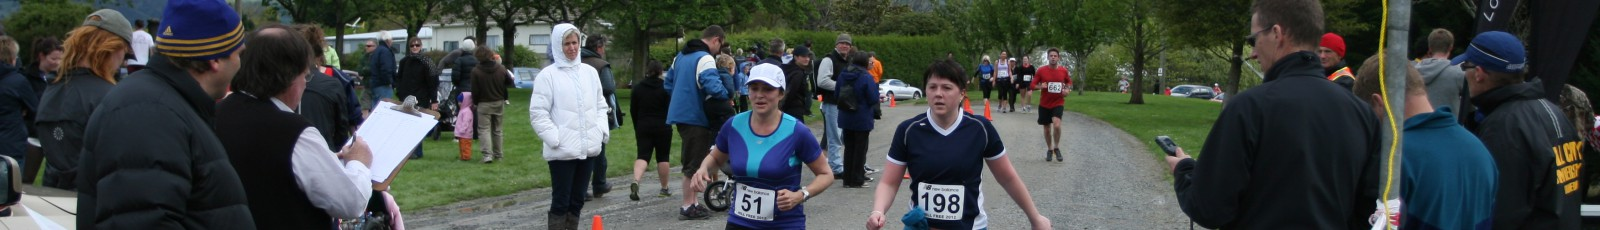 Finishing the Outram Half Marathon